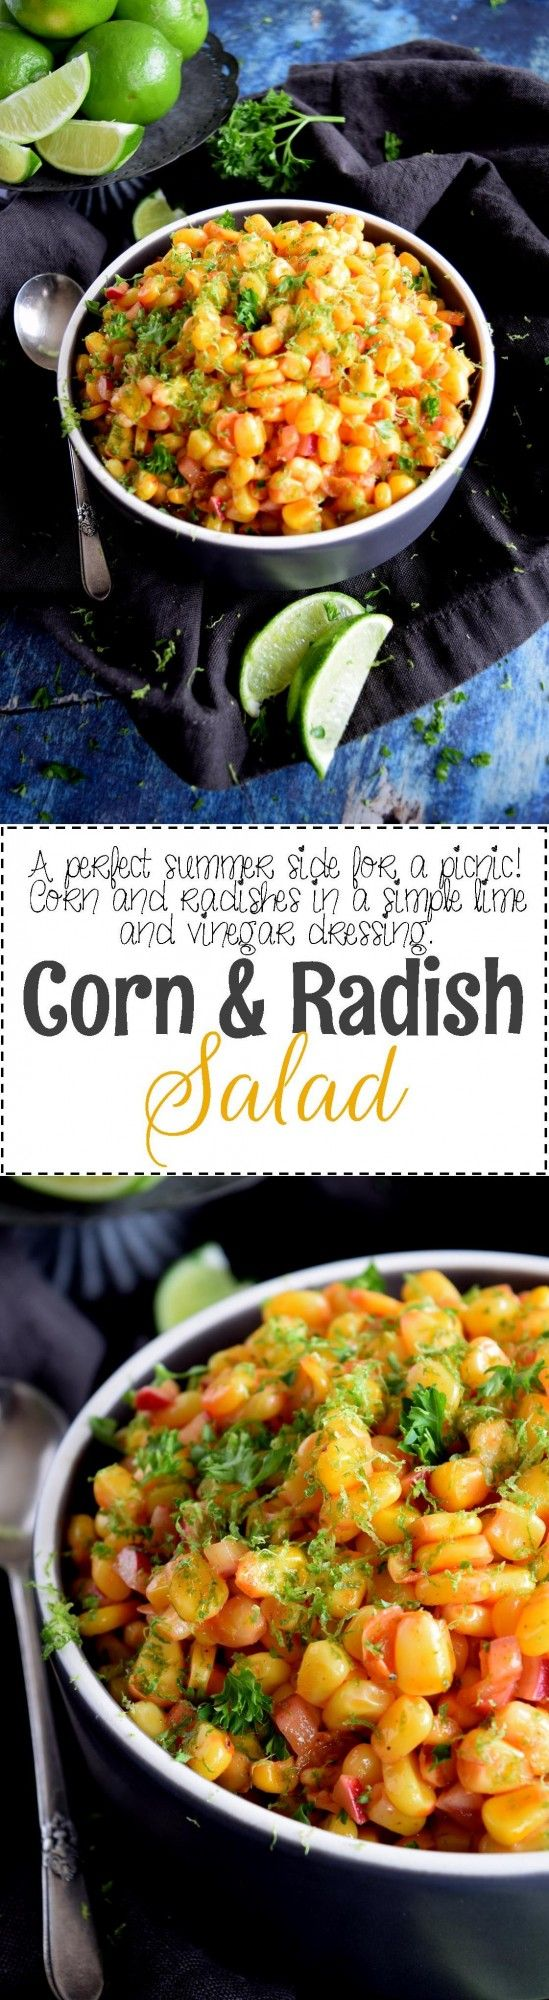 Corn and Radish Salad - Lord Byron's Kitchen